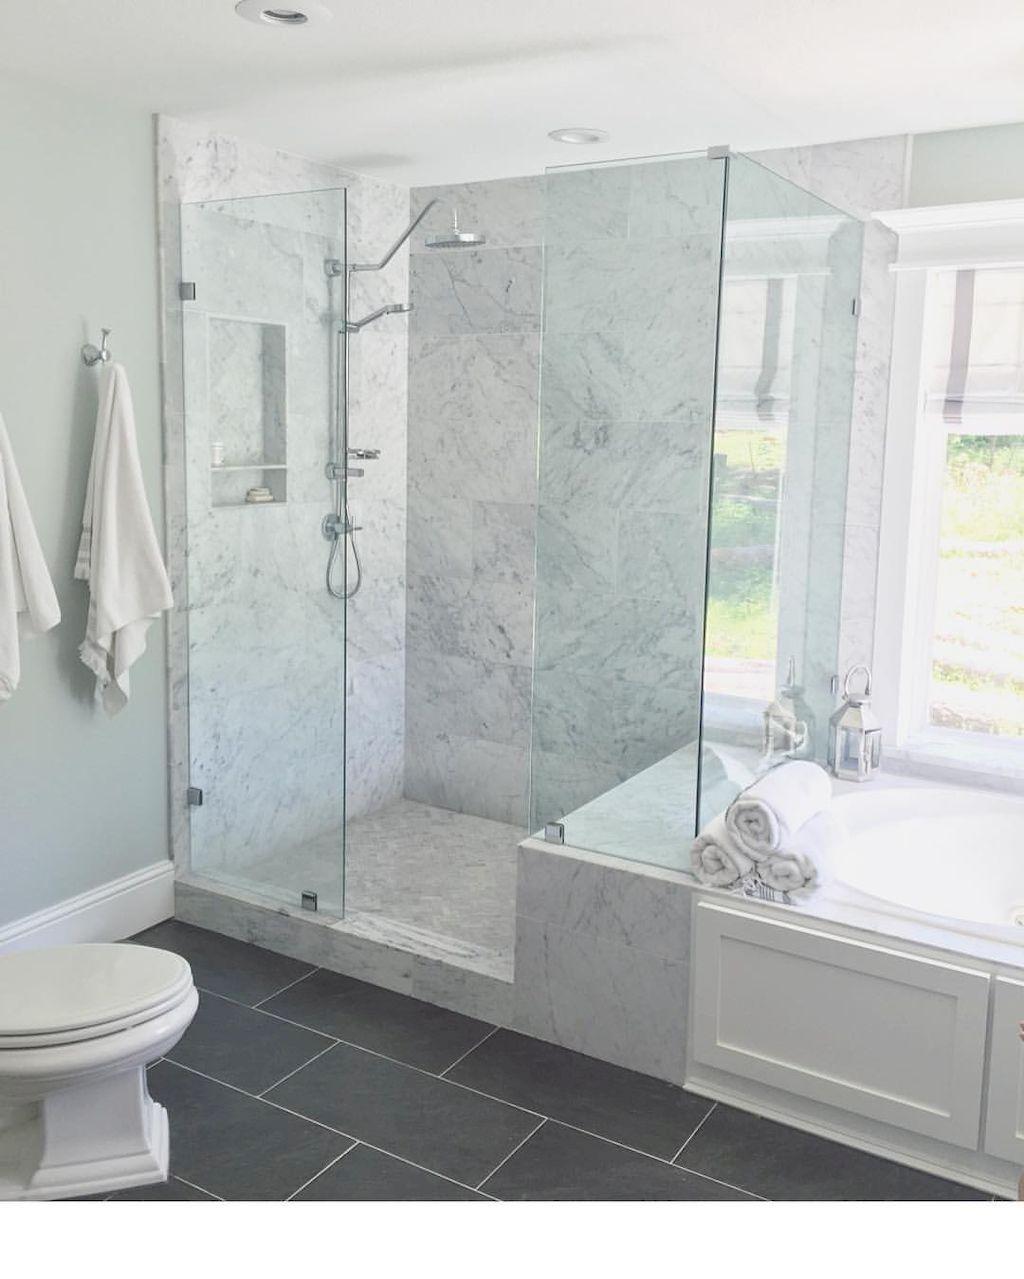 80 Stunning Tile Shower Designs Ideas For Bathroom Remodel 47 Master Bathroom Shower Bathroom Remodel Master Bathrooms Remodel